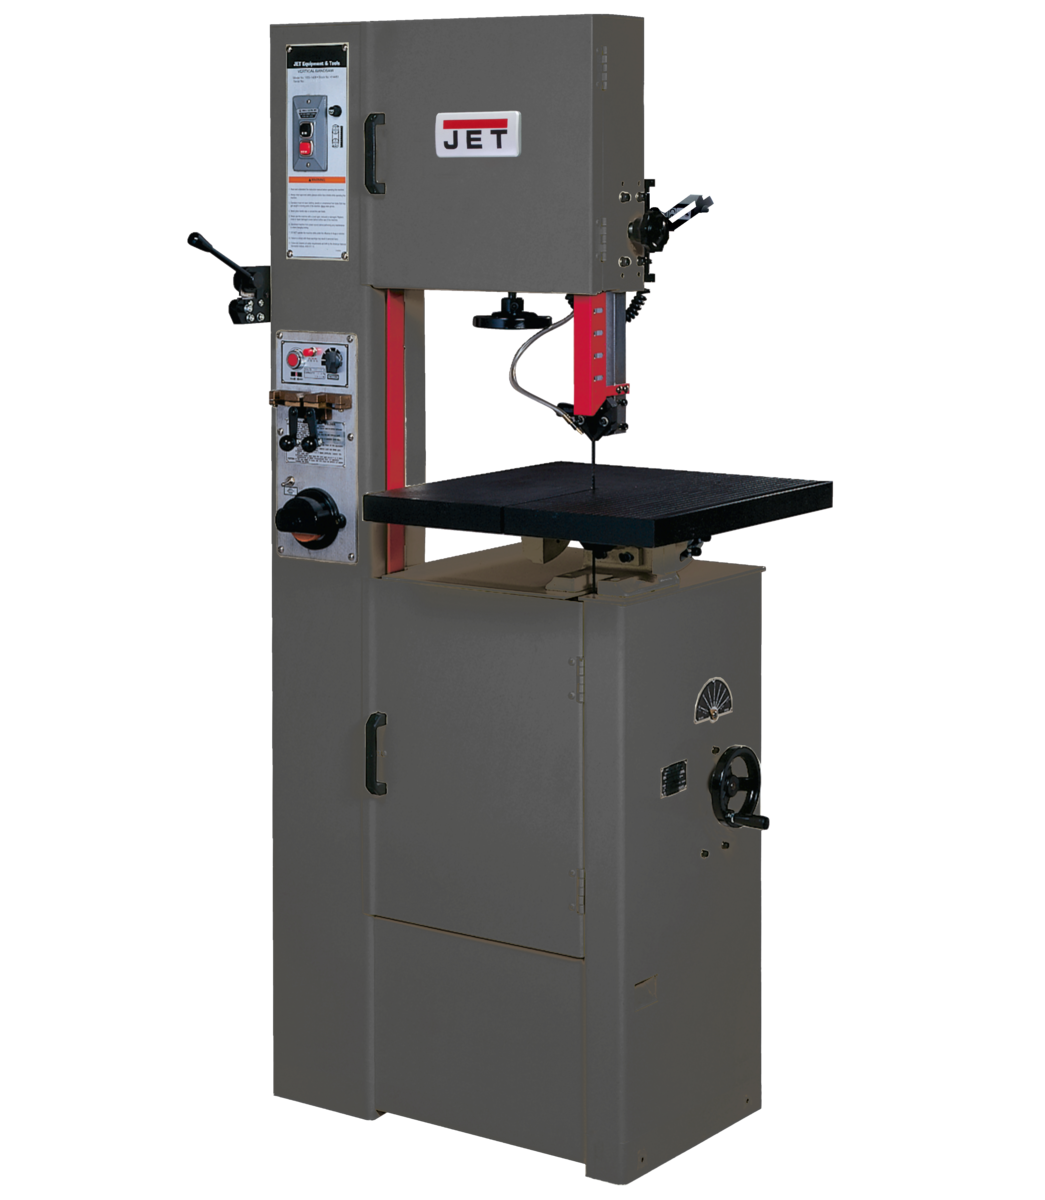 "Sierra-cinta vertical de 14"", 1 HP, 115/230 V, monofásica, 115/230 V"